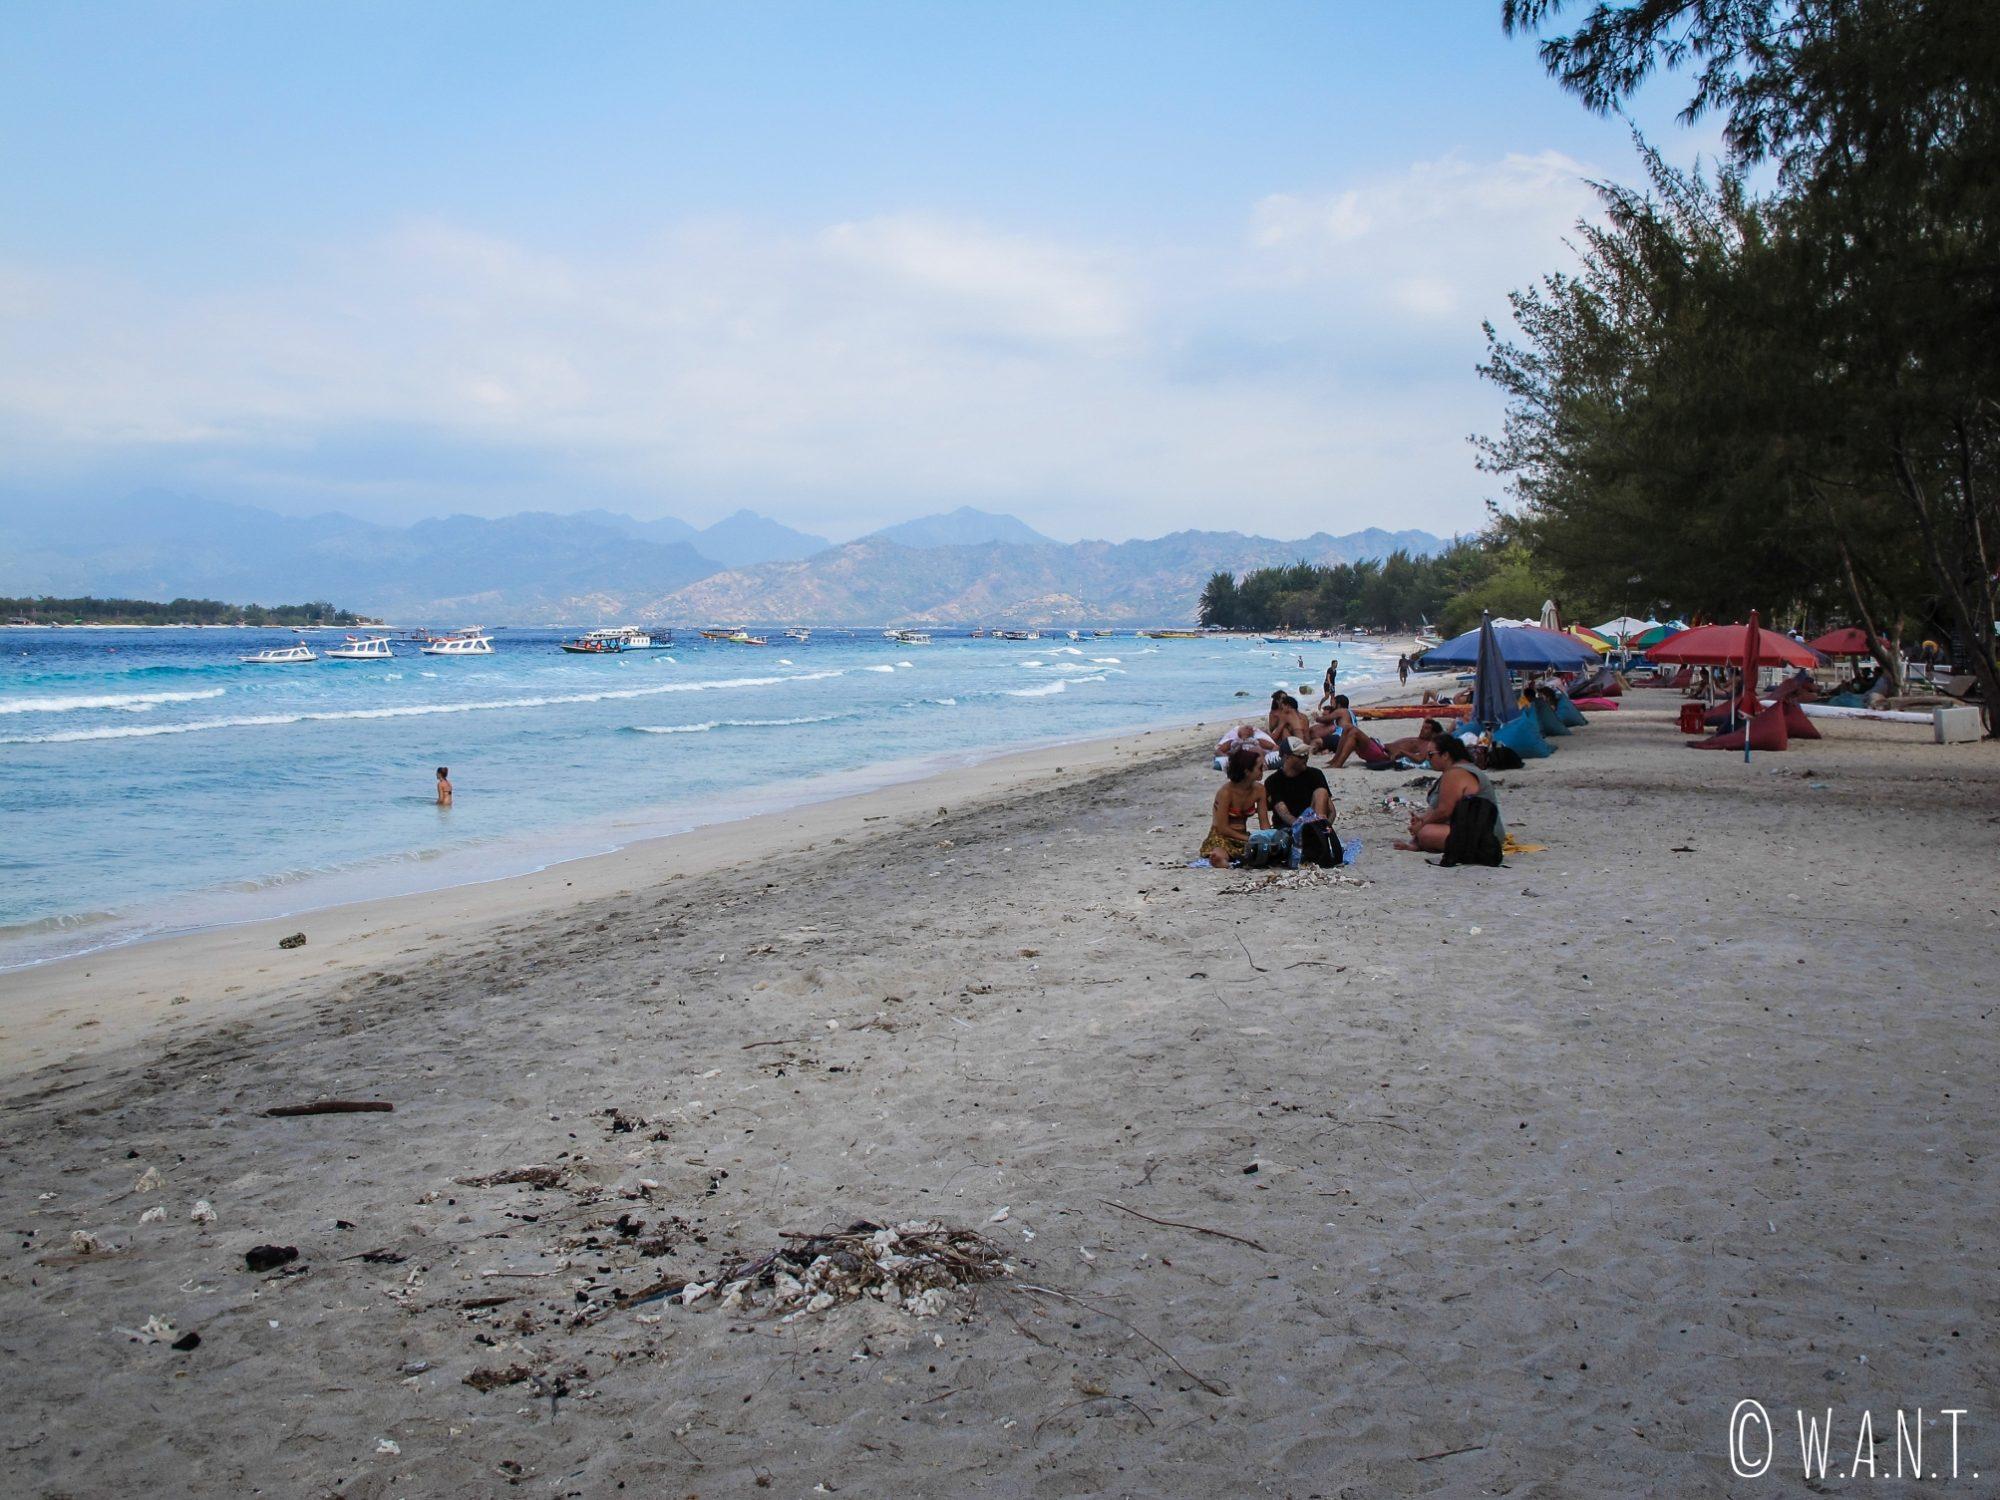 2017 - Plan large de la plage à la sortie du village de Gili Trawangan